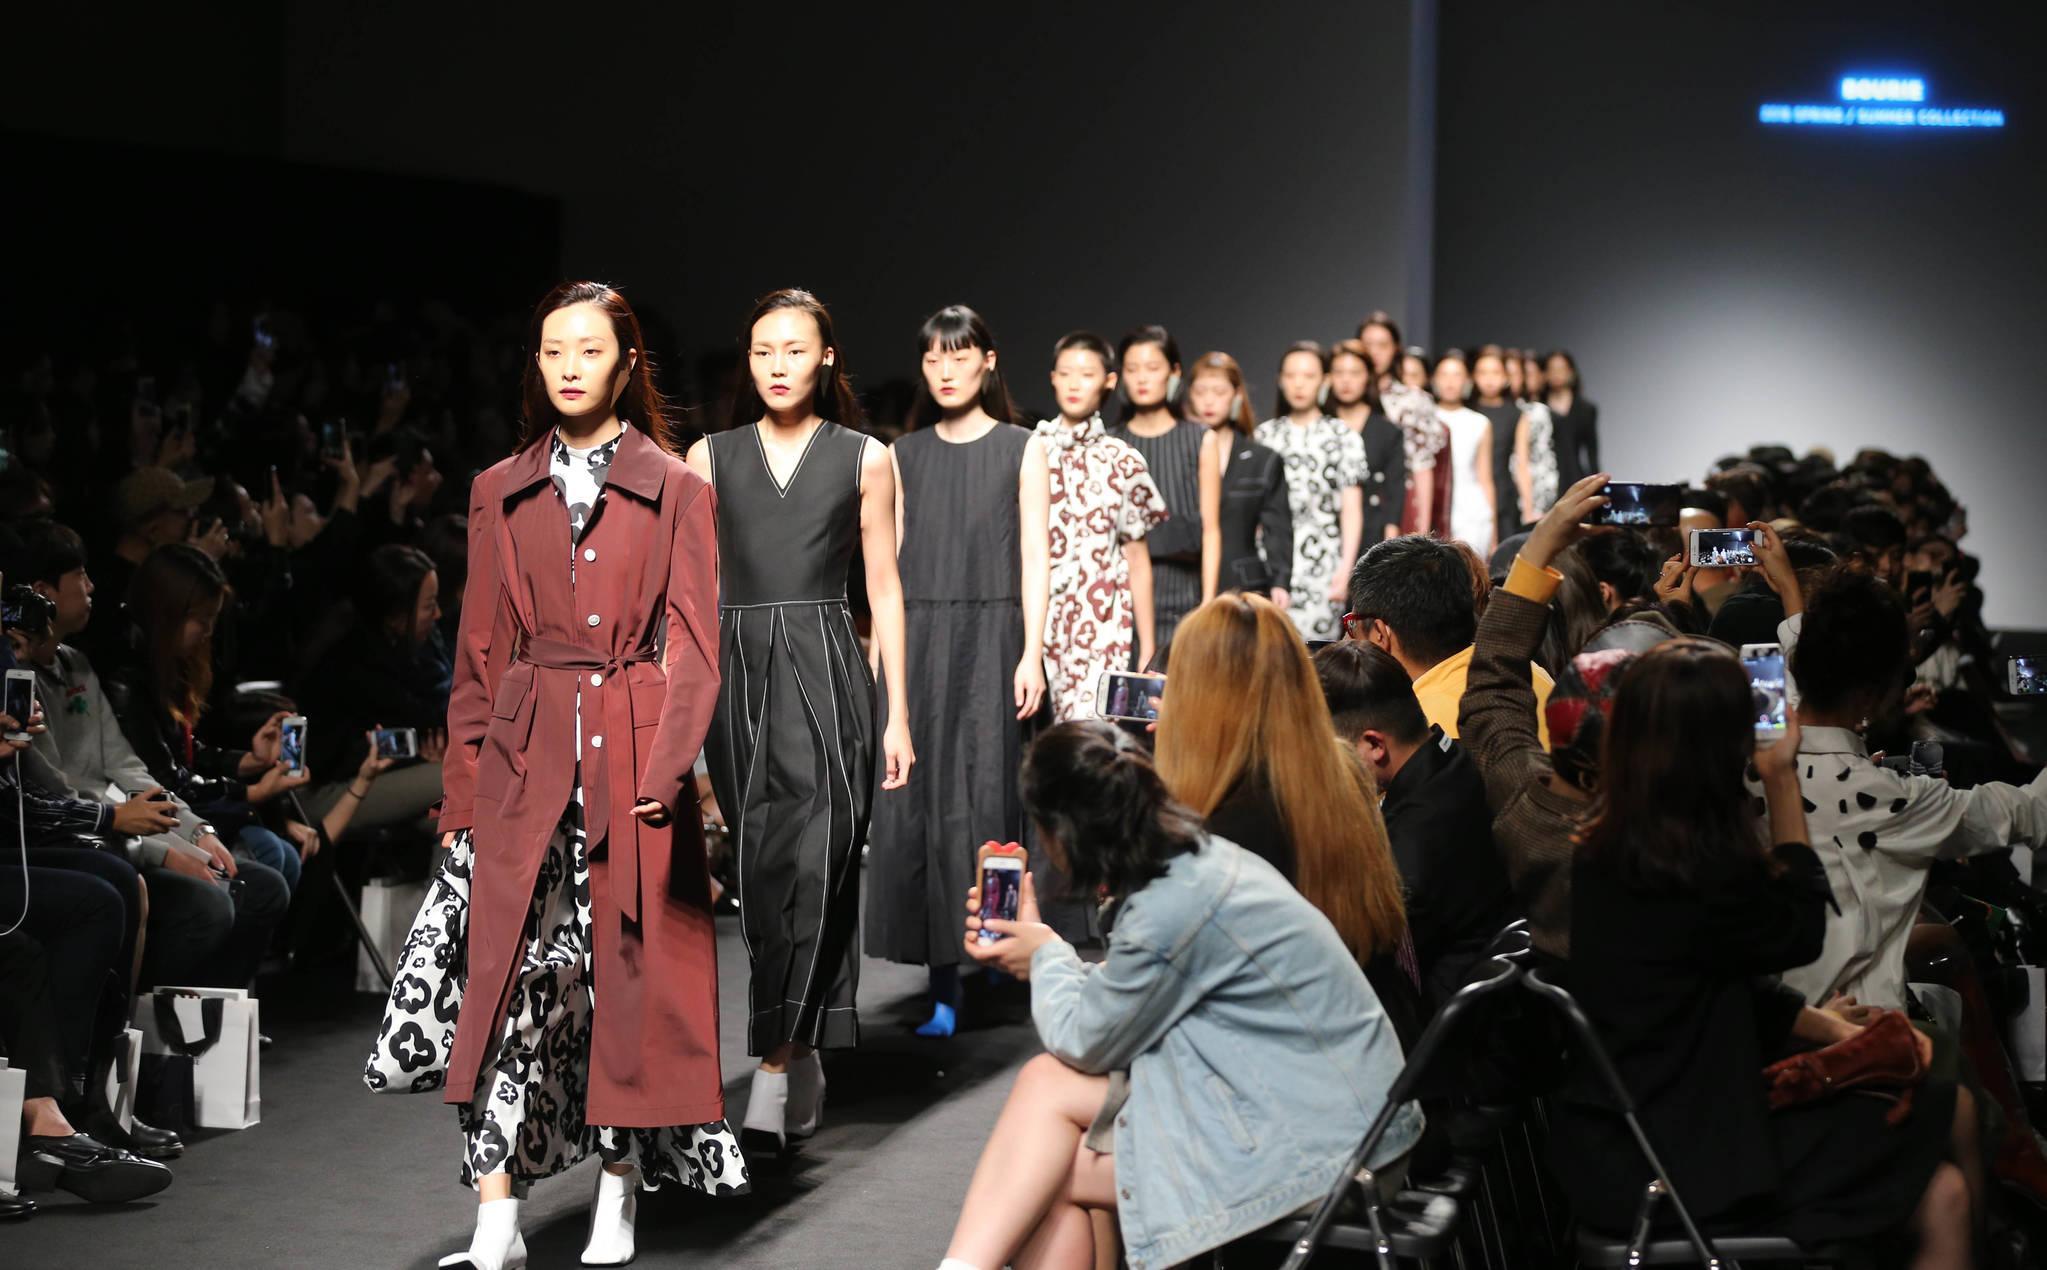 DDP에서 17일 부리(BOURIE)의 패션쇼가 열렸다. 모델들이 워킹을 하고 있다. 신인섭 기자